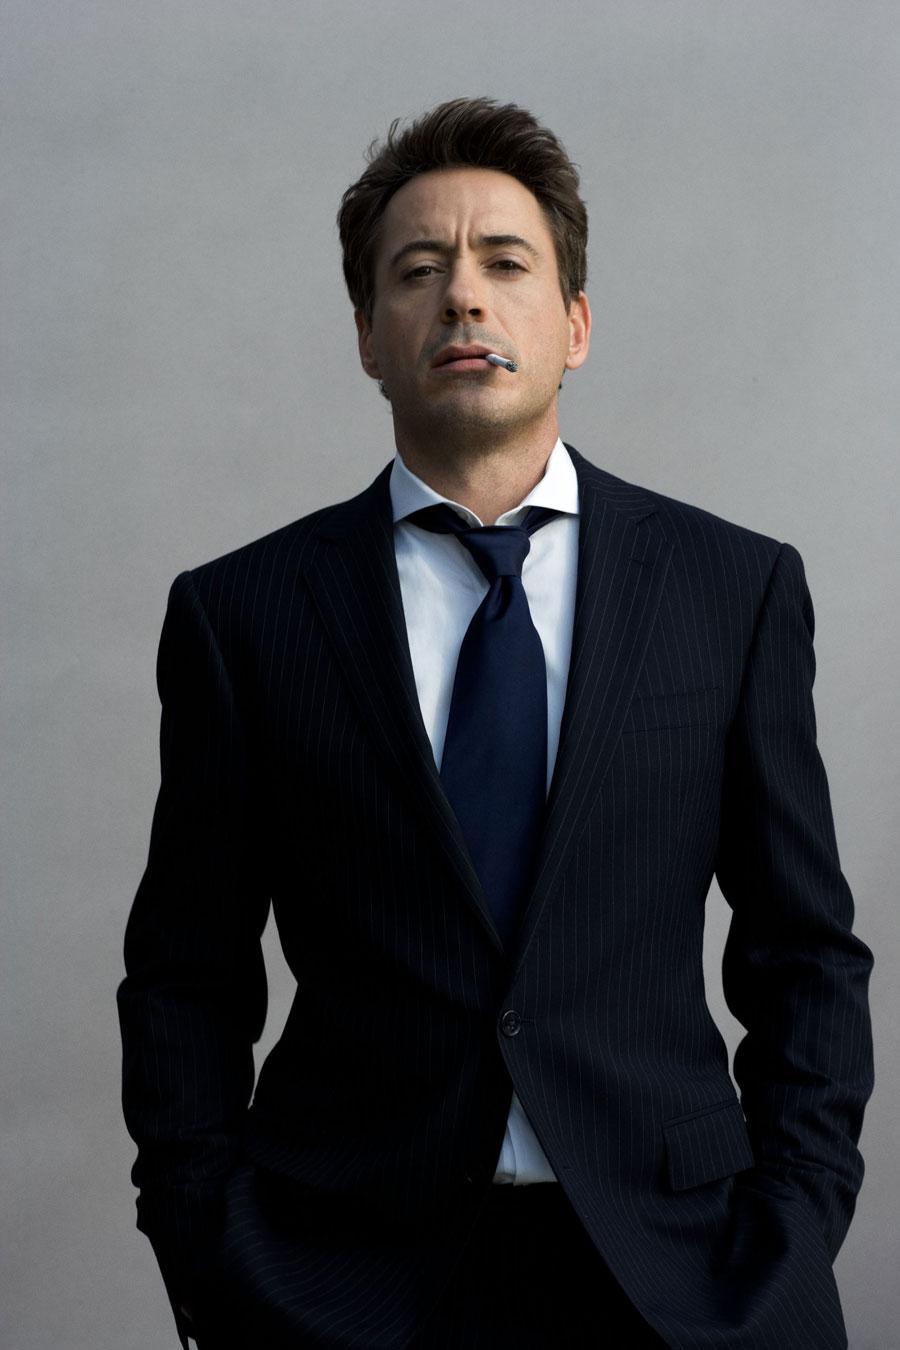 Facebook Covers For Robert Downey Jr Popopicscom